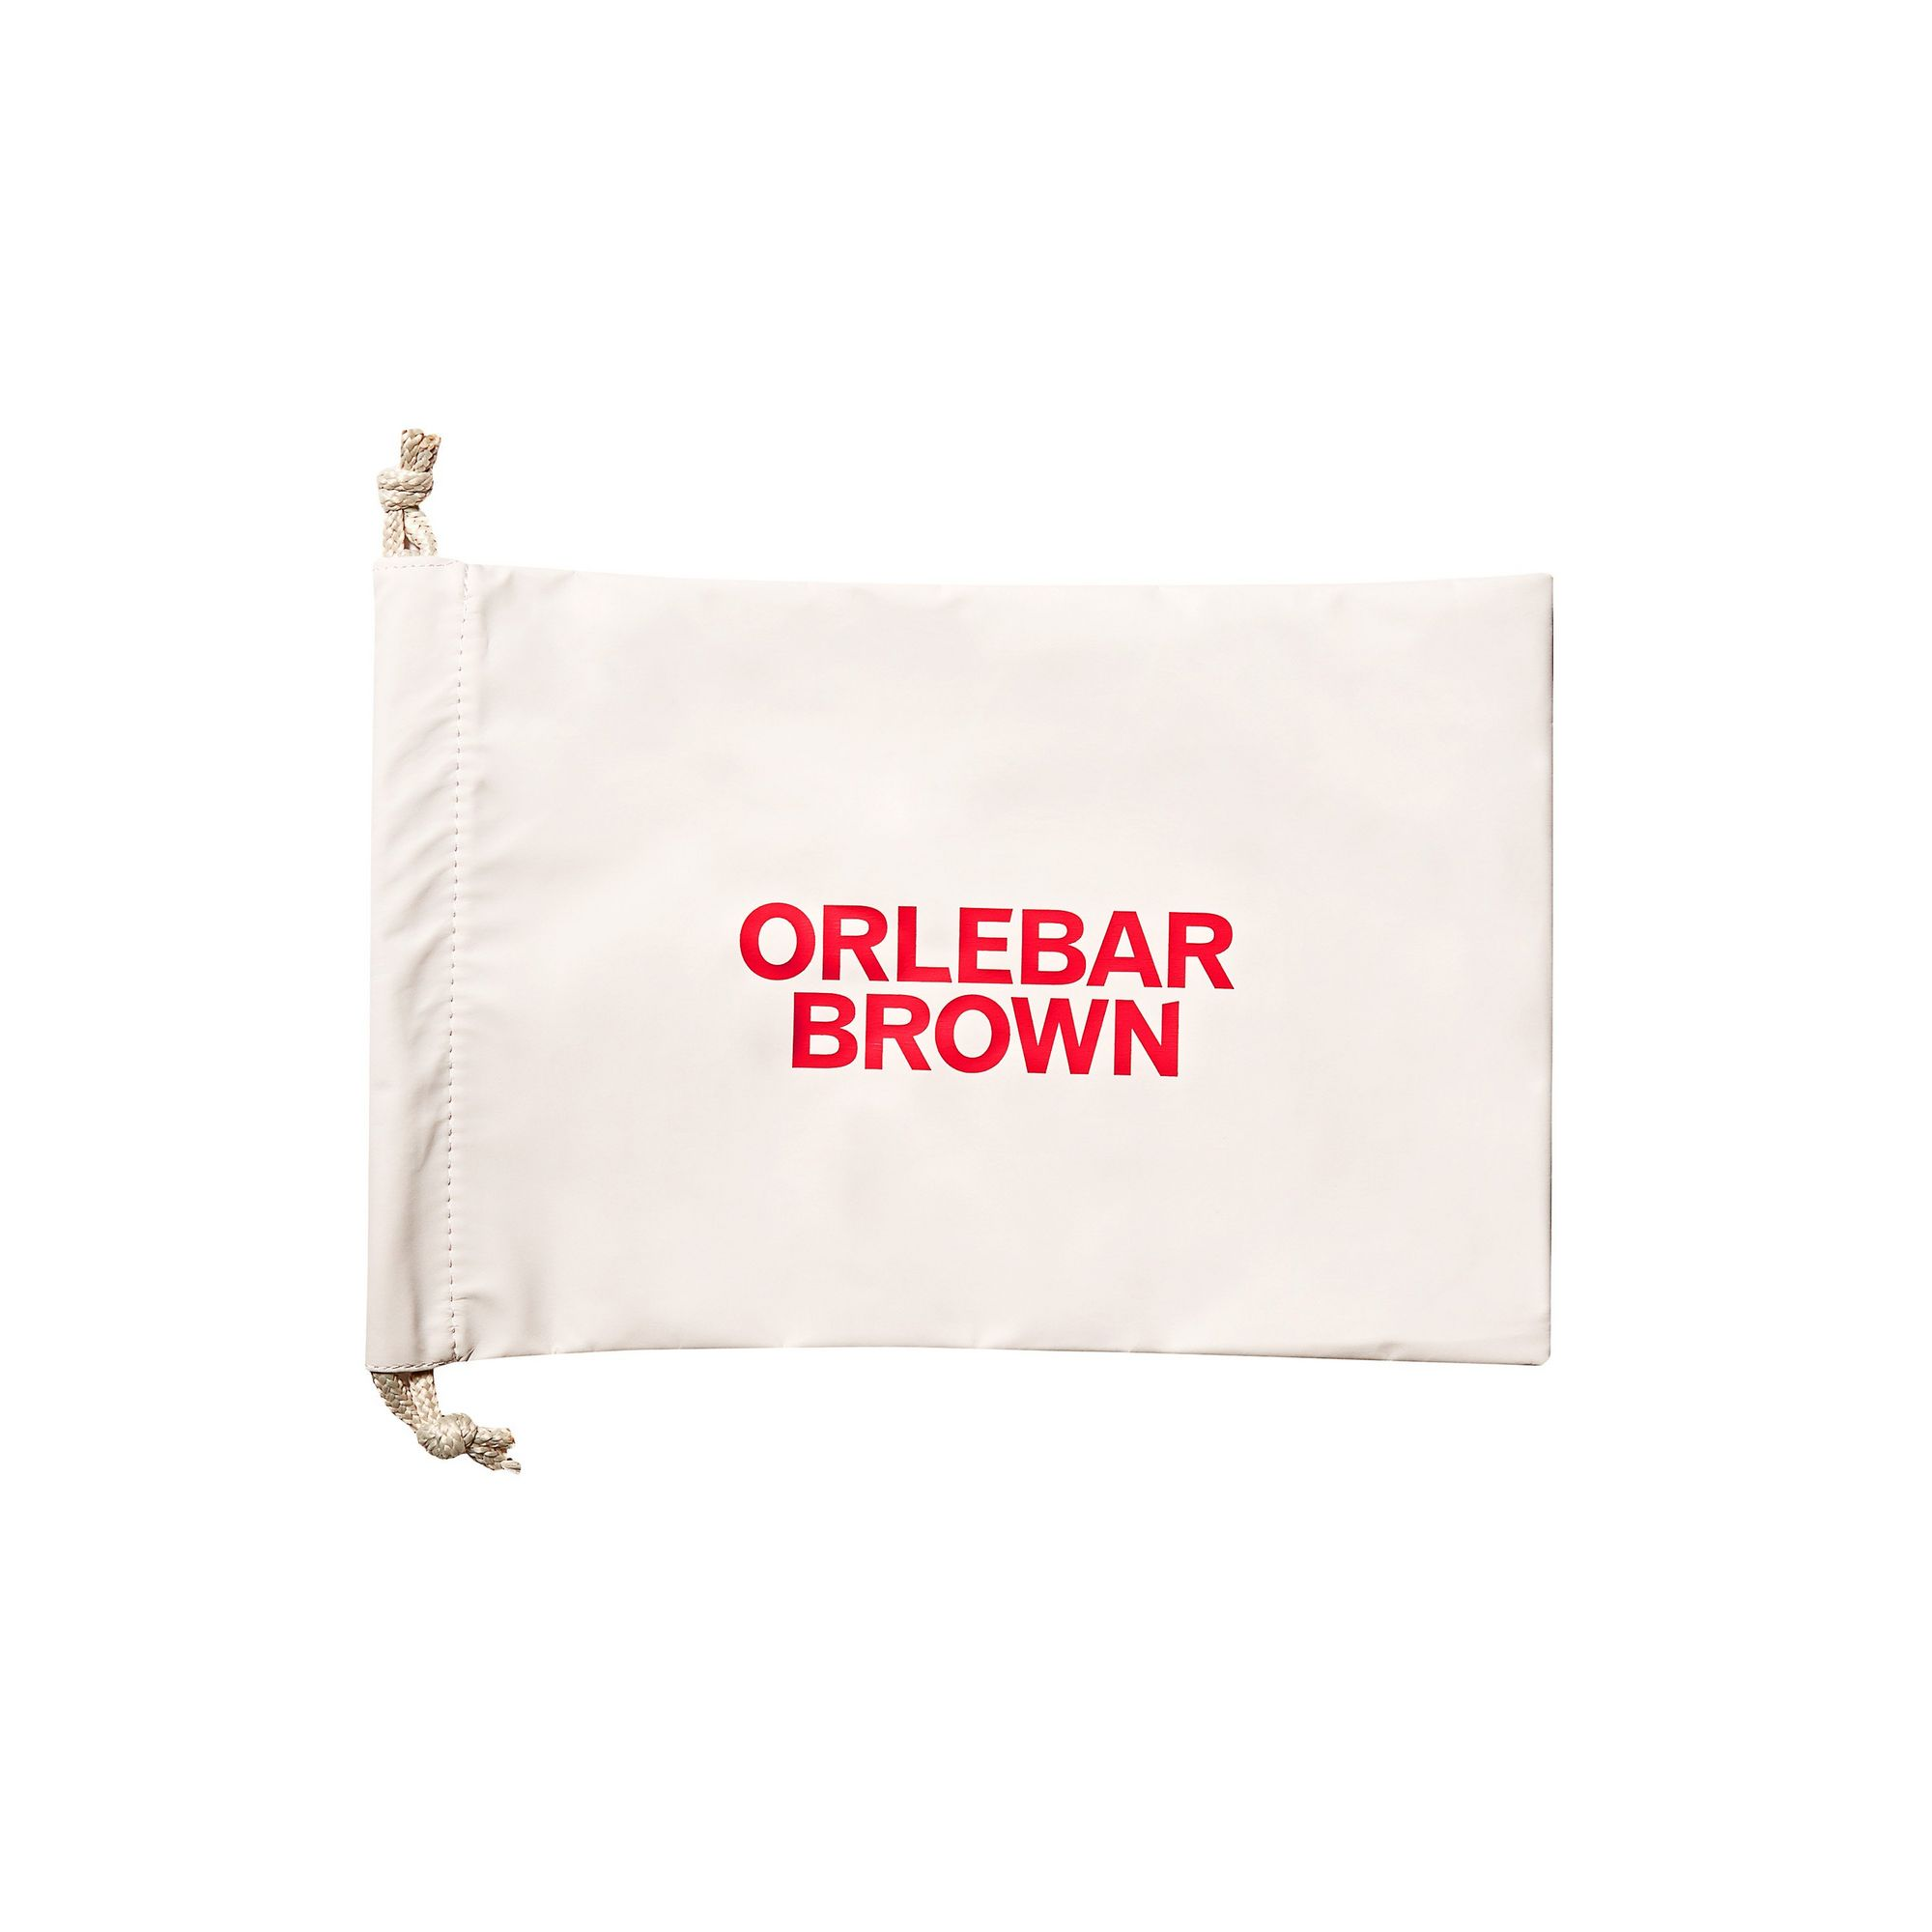 Orlebar Brown Setter X